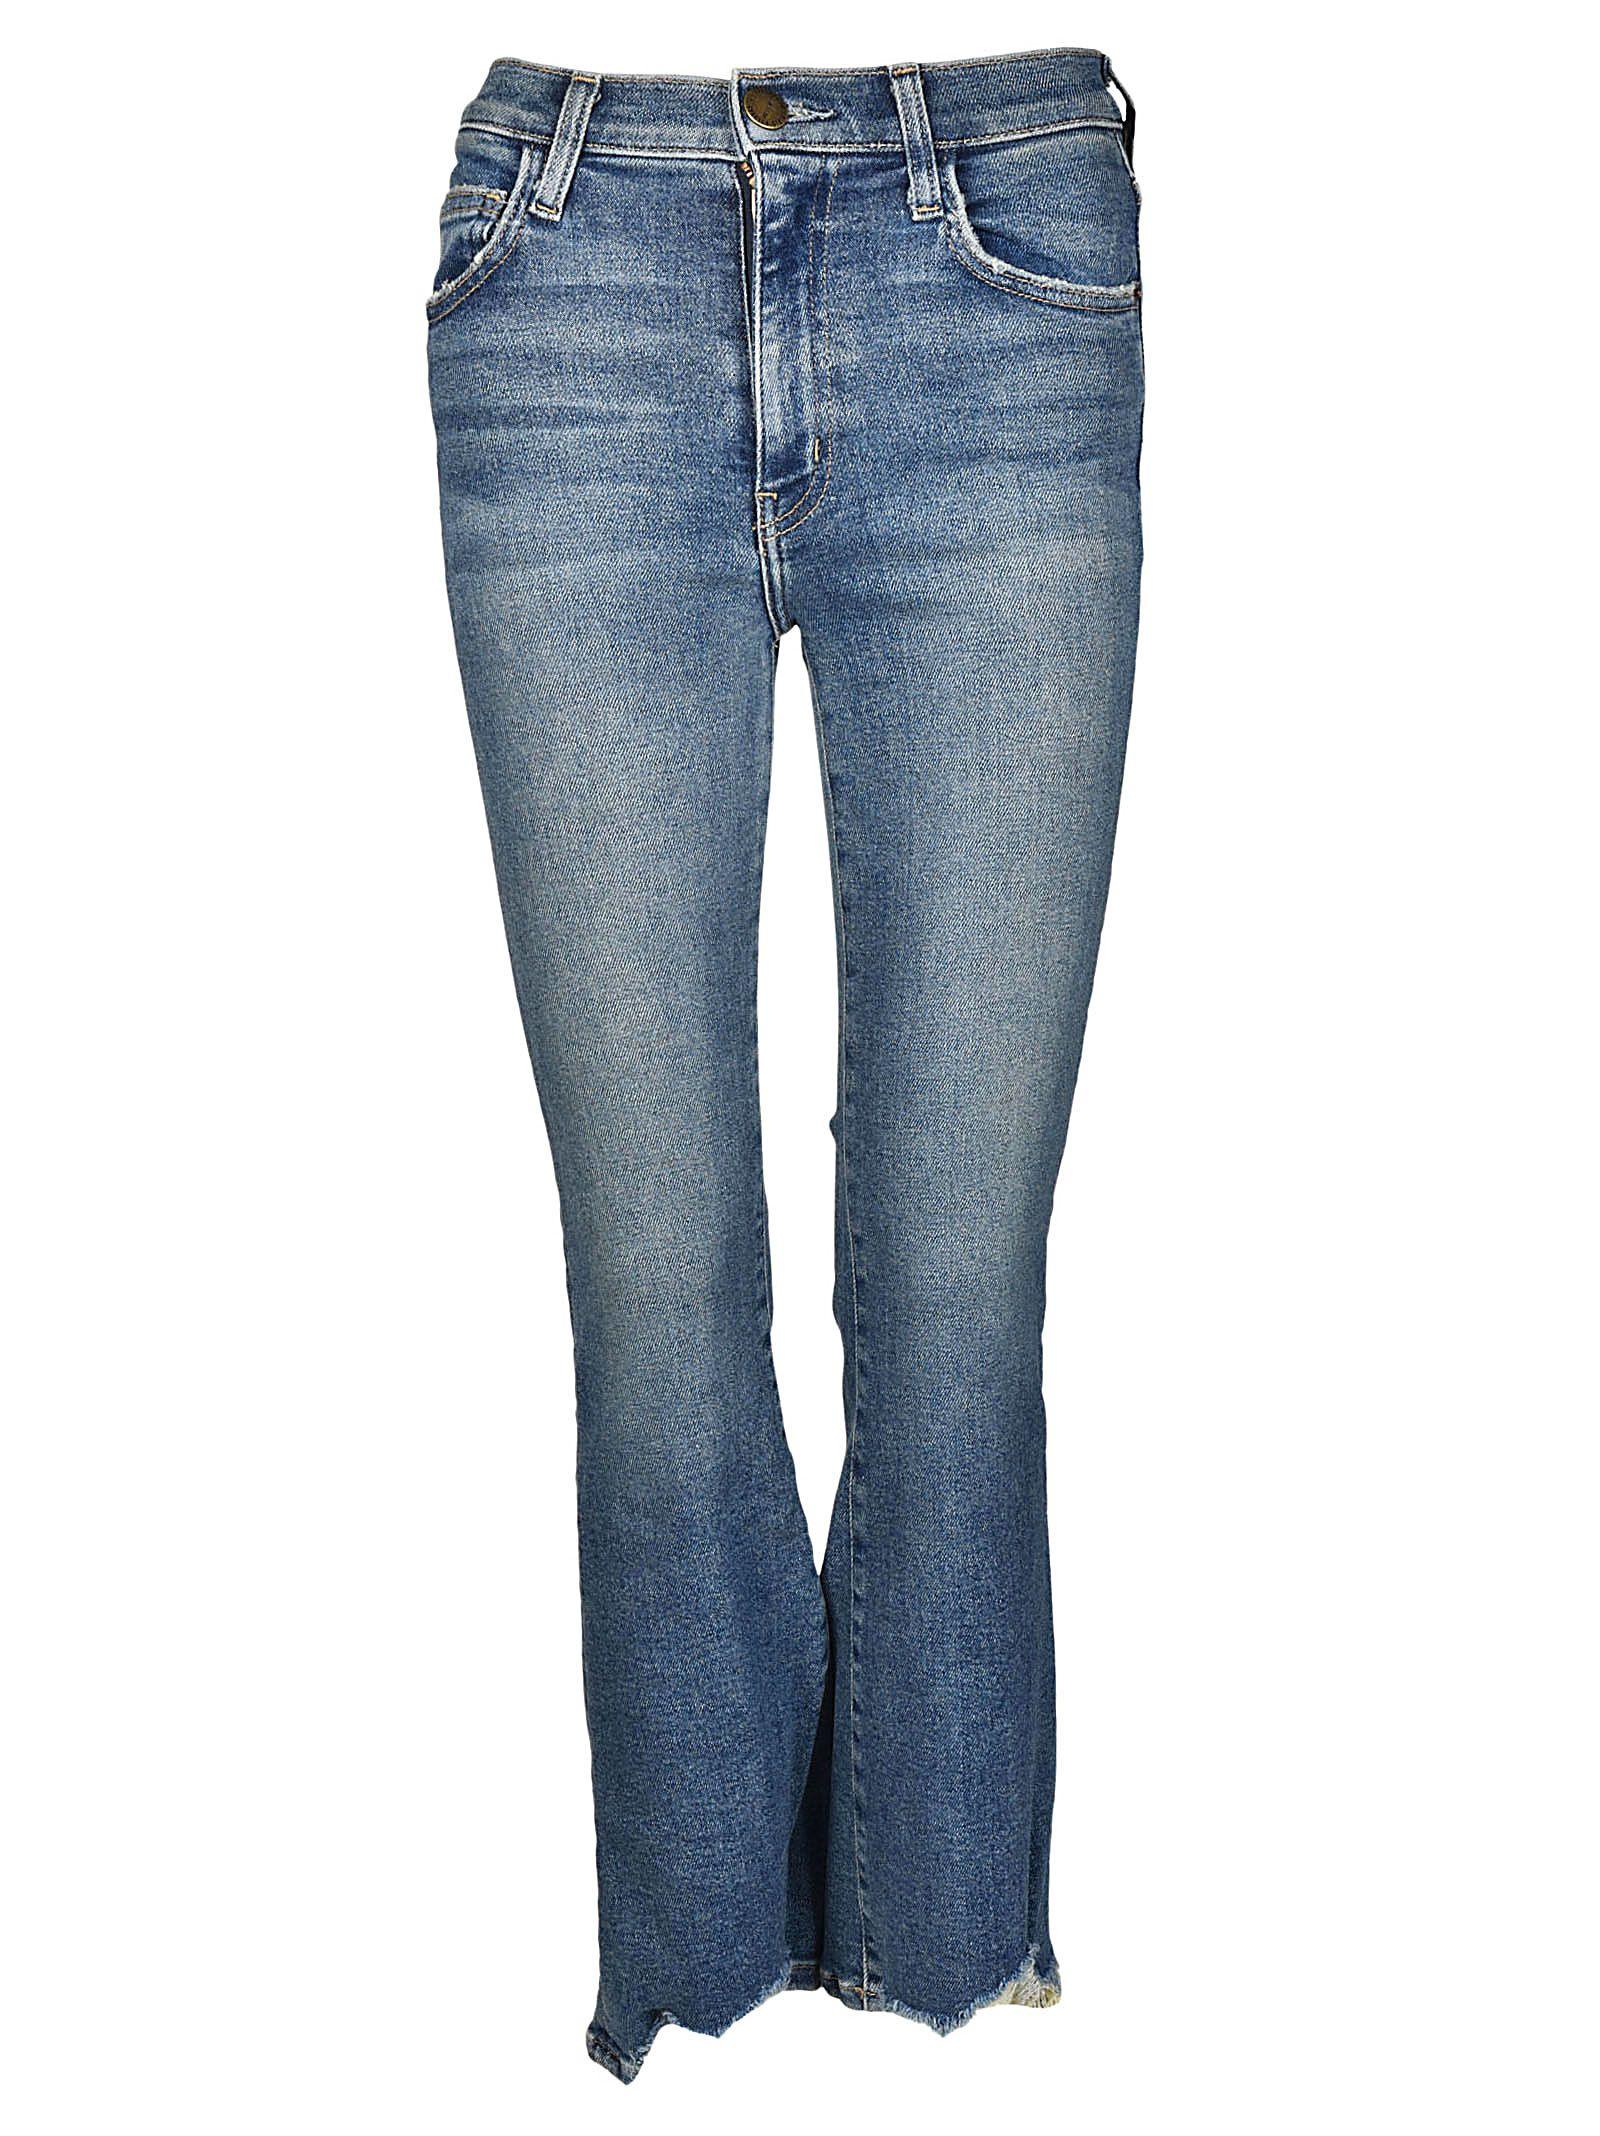 Current/elliott Woman Flared Jeans Dark Denim Size 25 Current Elliott mIFyJ3Vh